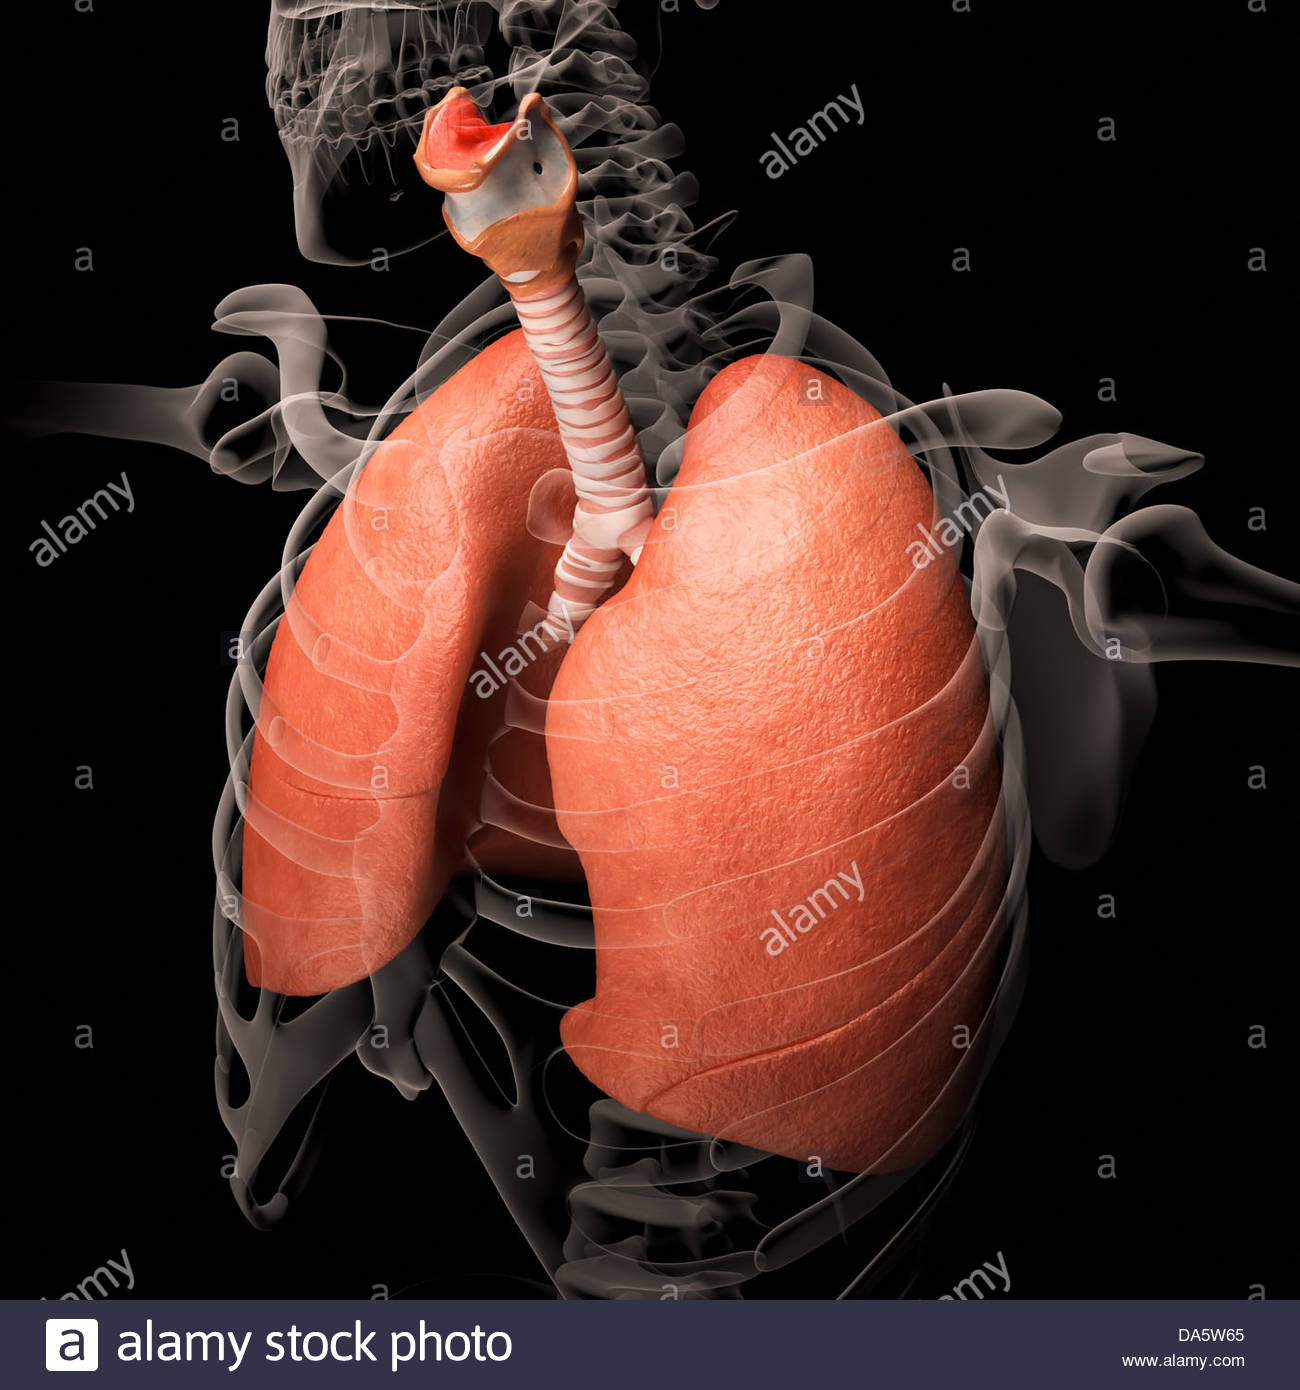 Digital medical illustration depicting the human respiratory system. Transparent skeleton reveals the respiratory - Stock Image